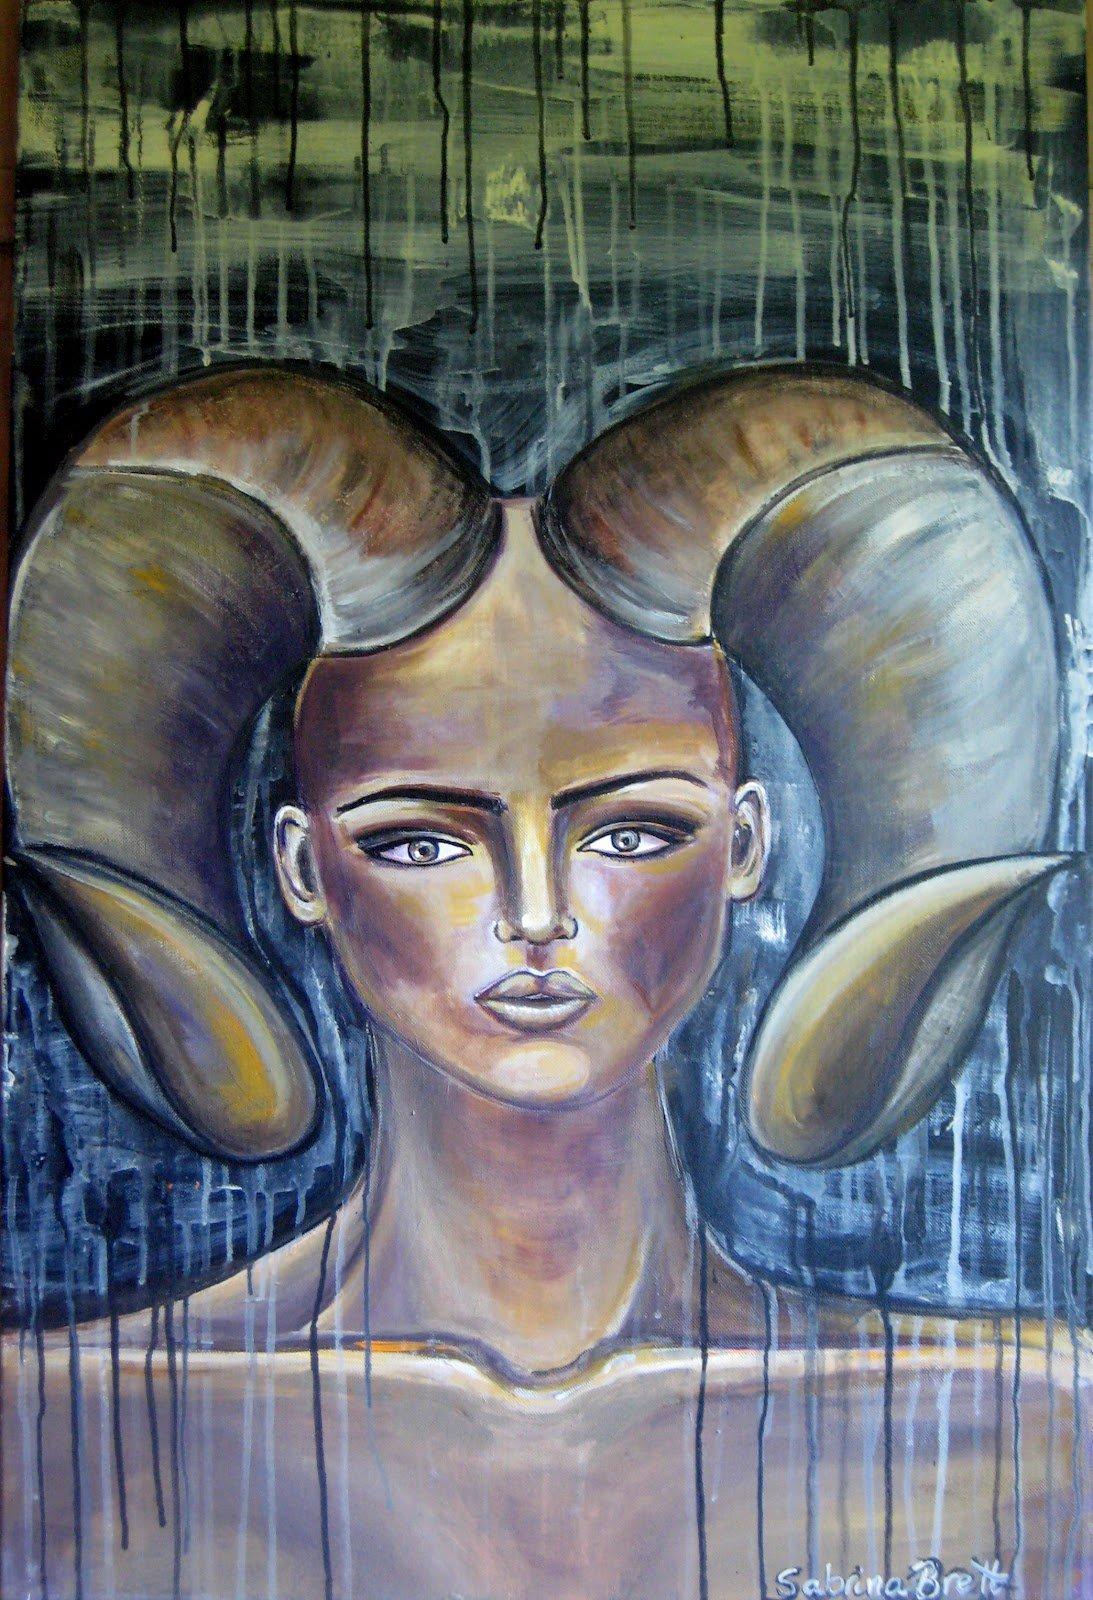 Heaven's Envoy, acrylic on canvas, by Sabrina Brett